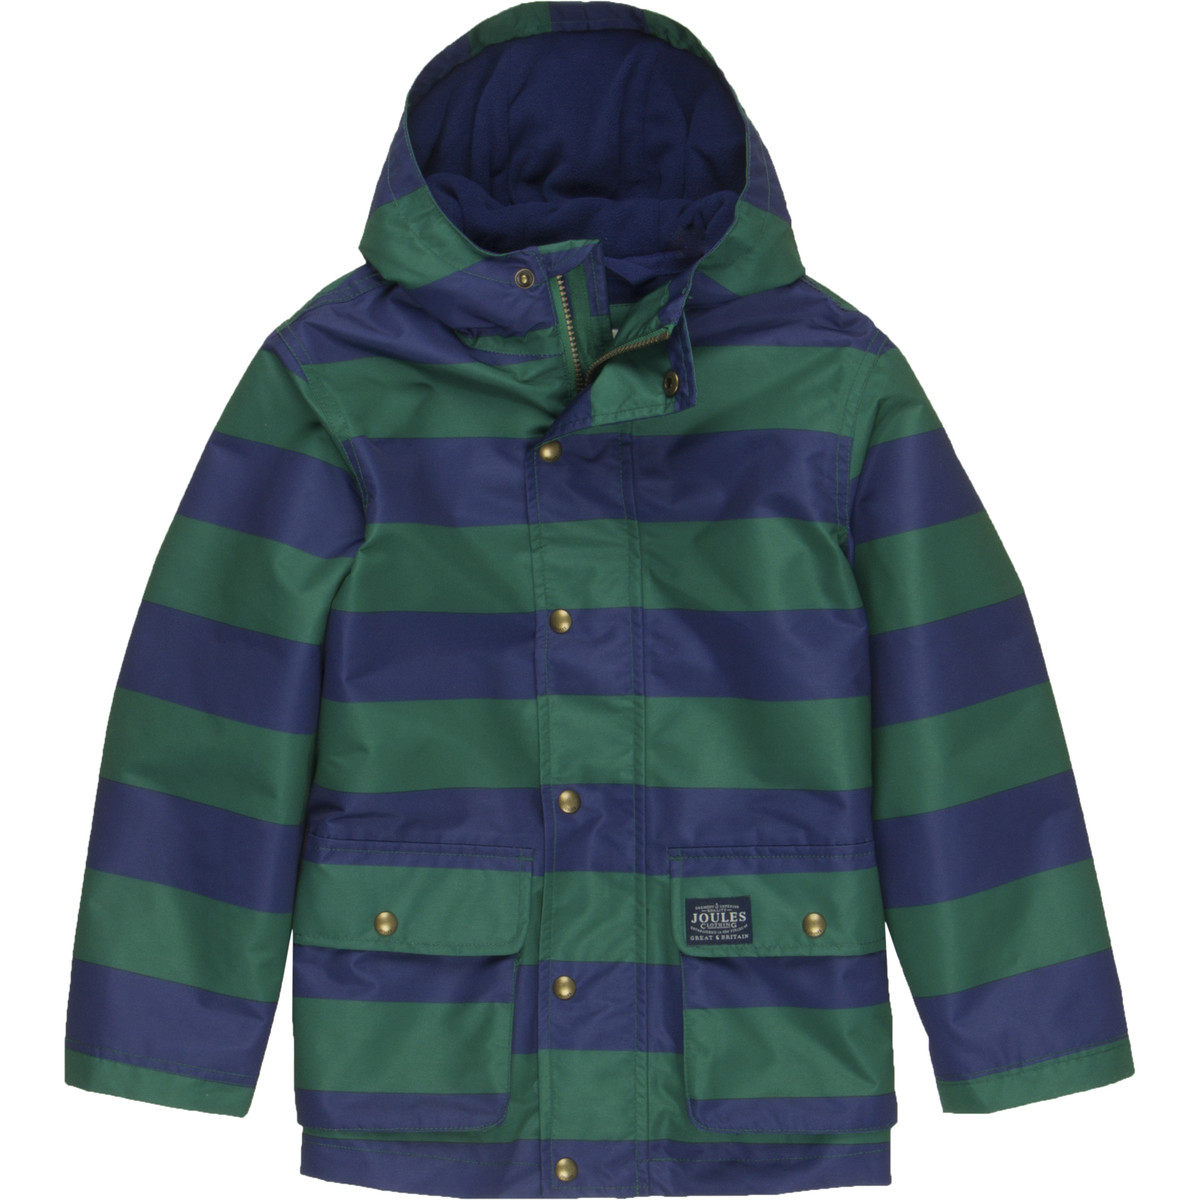 Joules JNR Maybury Fleece Lined Rain Jacket - Boys